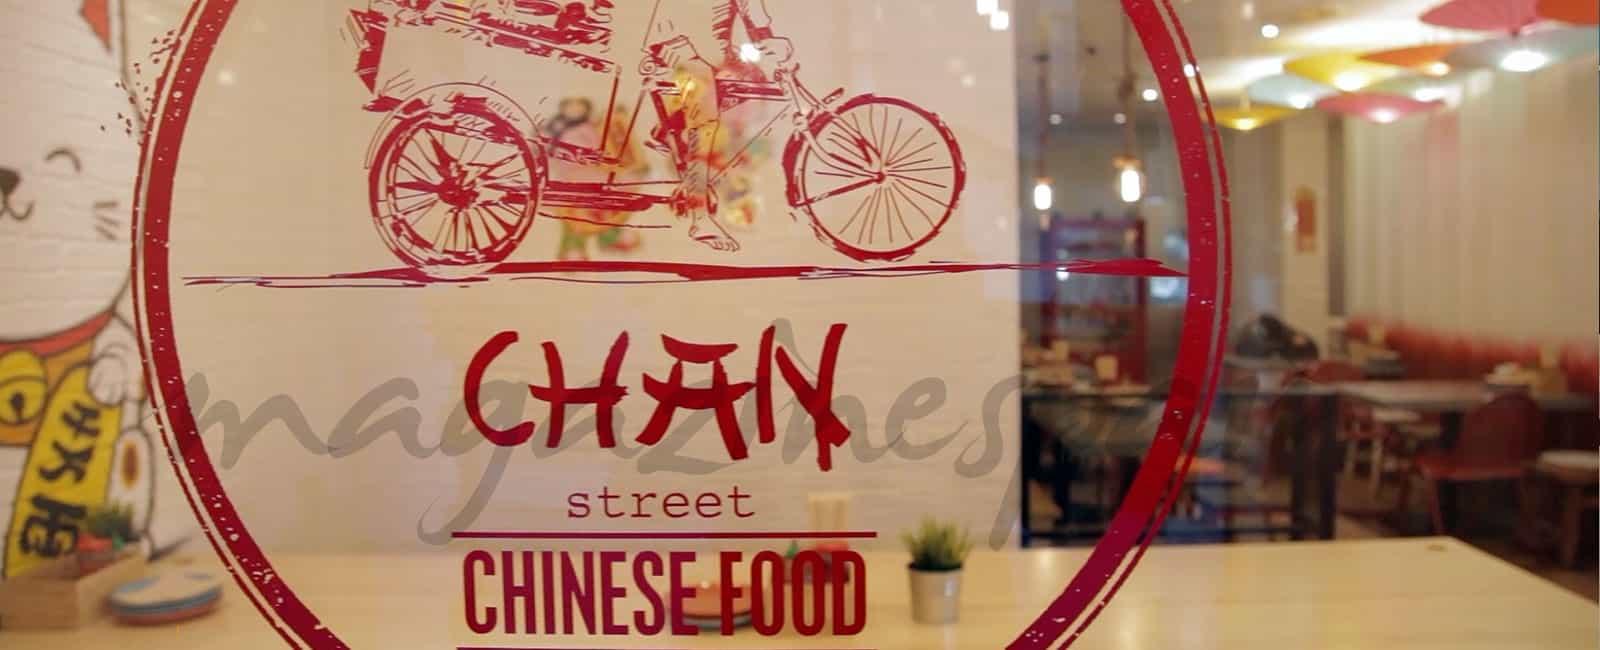 Chan Street, comida tradicional china…  por Fran Larrañaga